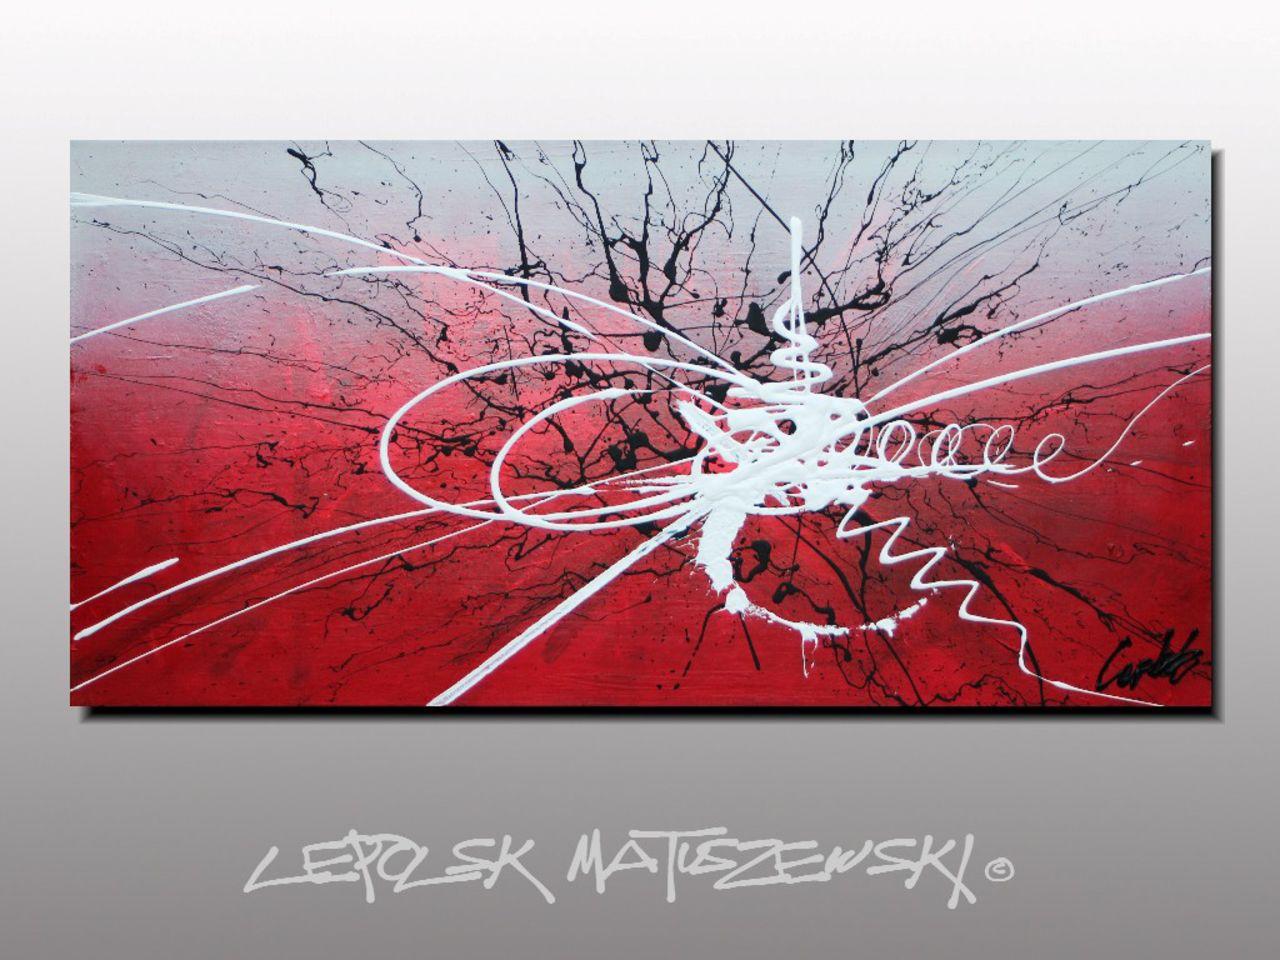 LEPOLSK MATUSZEWSKI EDONIA  expressionnisme abstrait contemporain